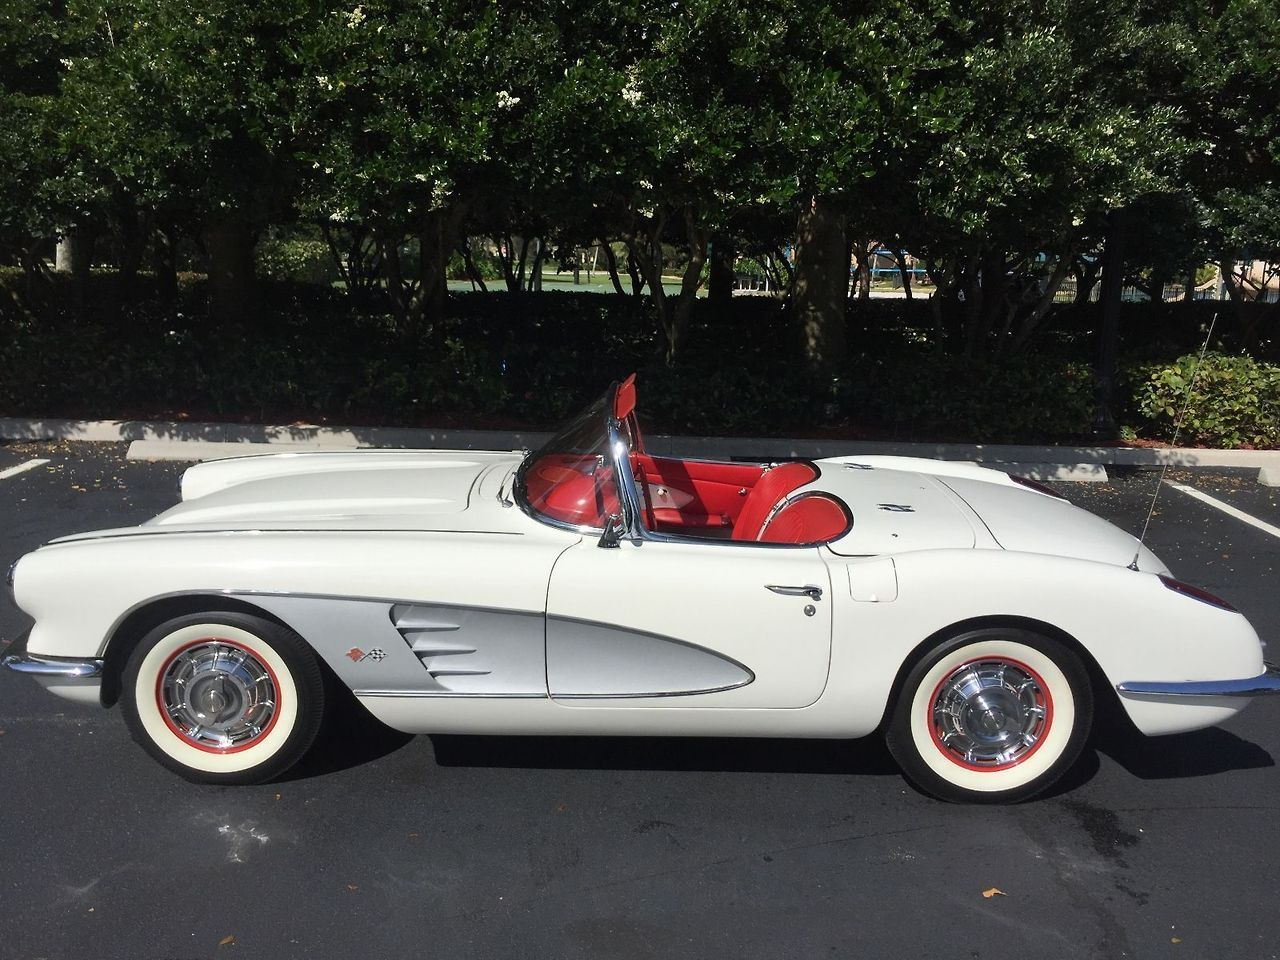 1960 Chevy Corvette Chevrolet Corvette Corvette Classic Cars